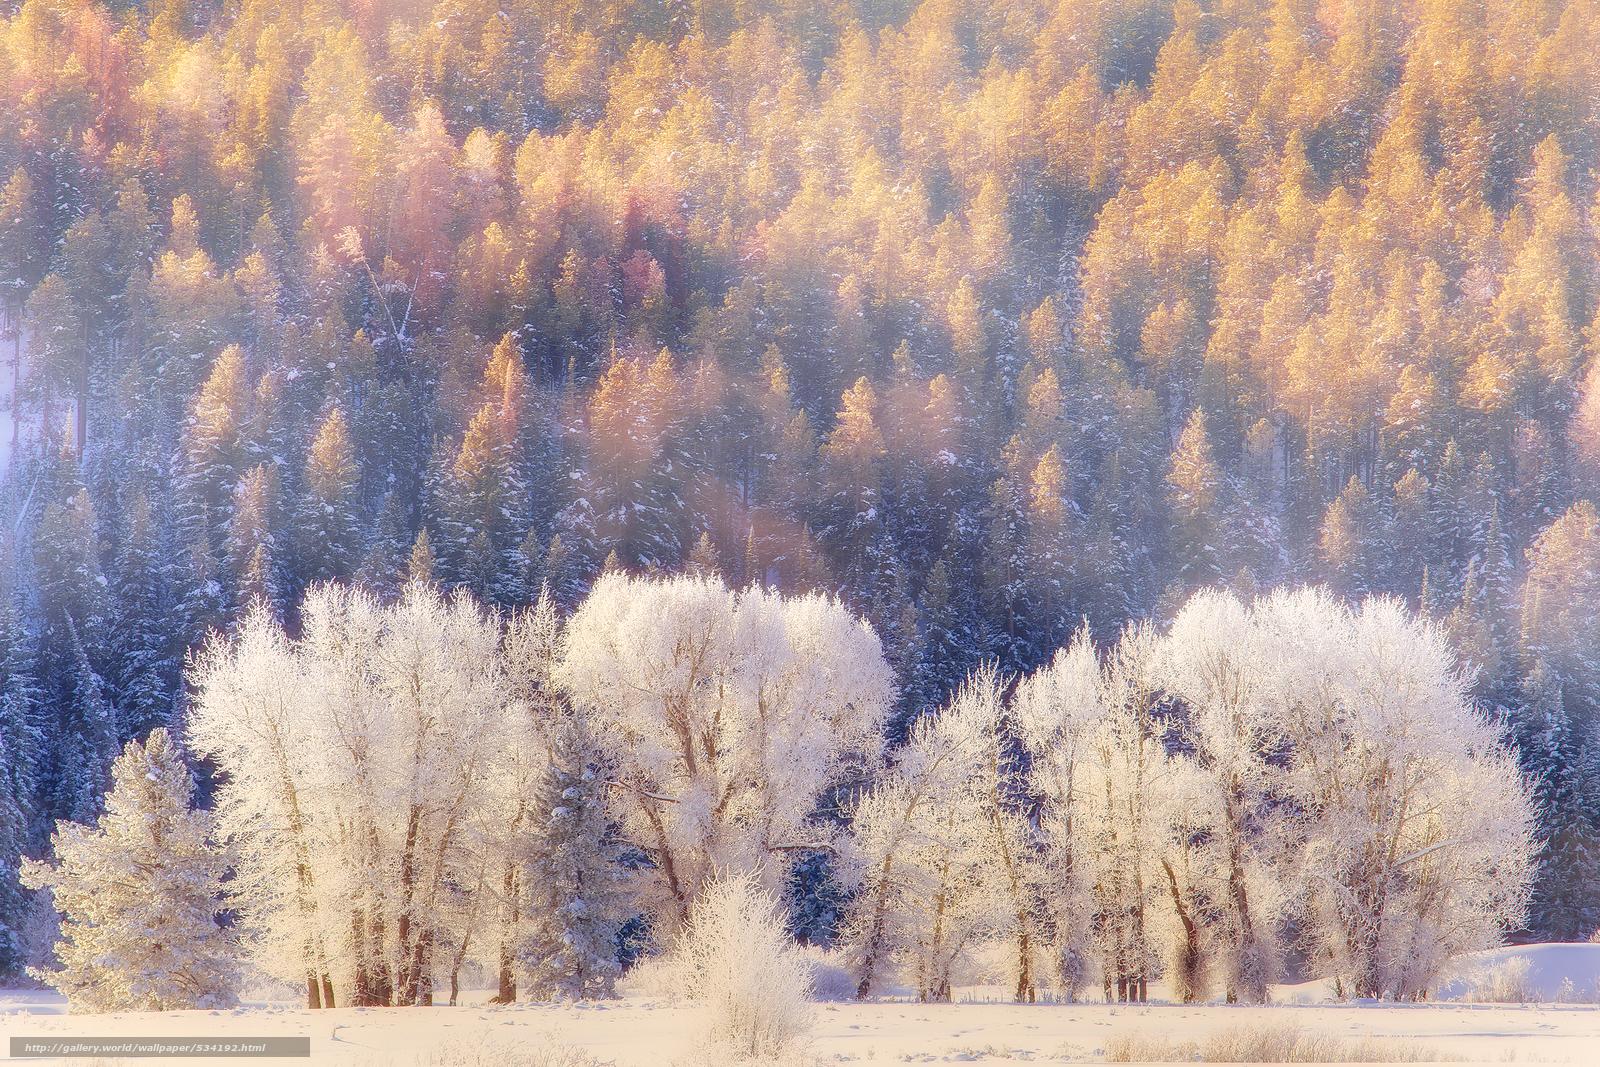 Download wallpaper winter dreams grand teton national for Sfondi invernali desktop